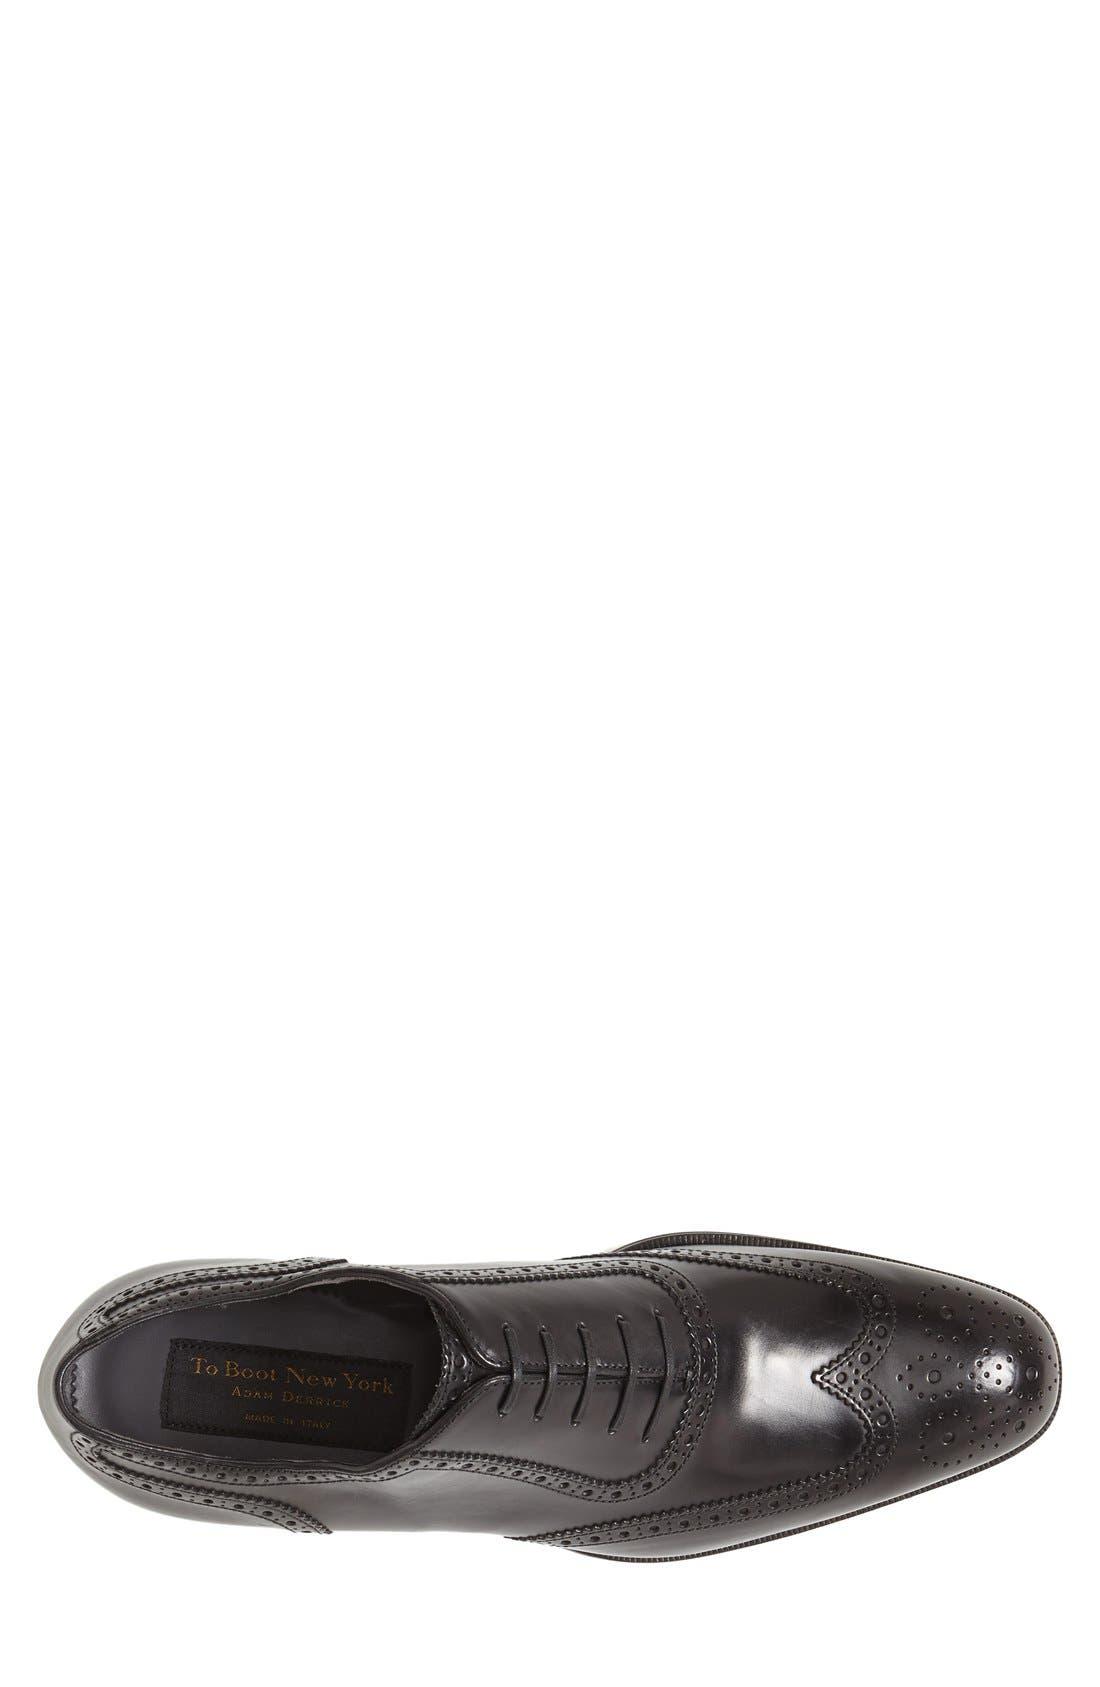 'Duke' Wingtip,                             Alternate thumbnail 5, color,                             Black Leather